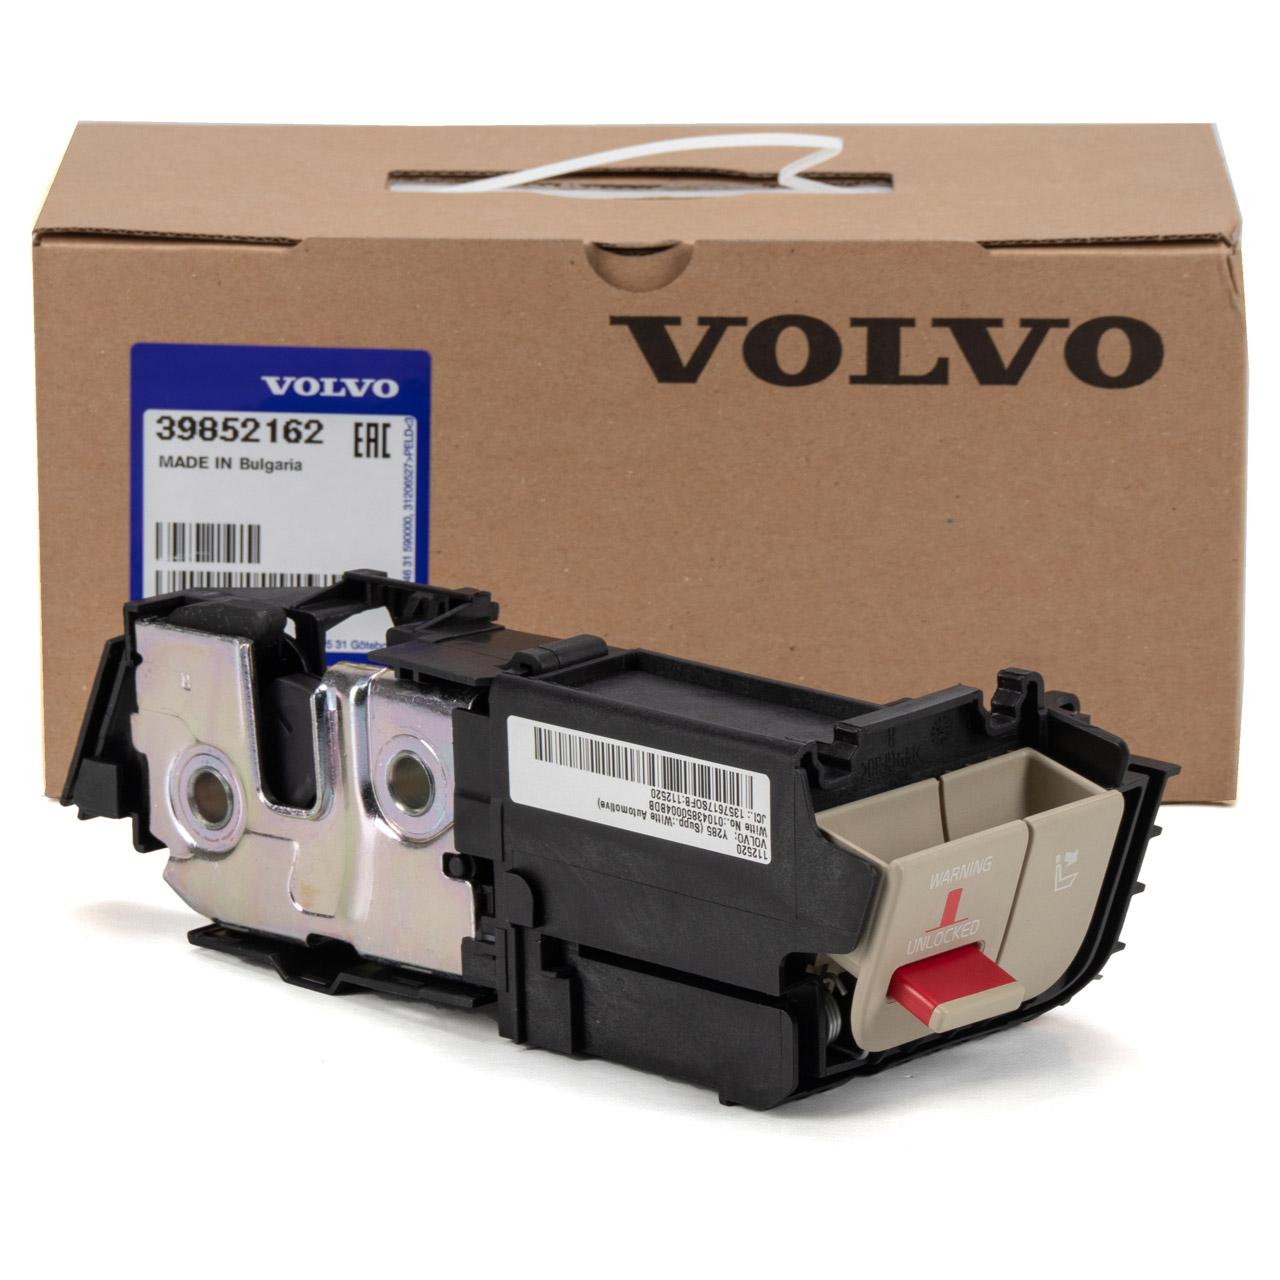 ORIGINAL Volvo Stellelement Sitzlehnenverstellung V60 I V70 III XC60 II XC70 II 39852162